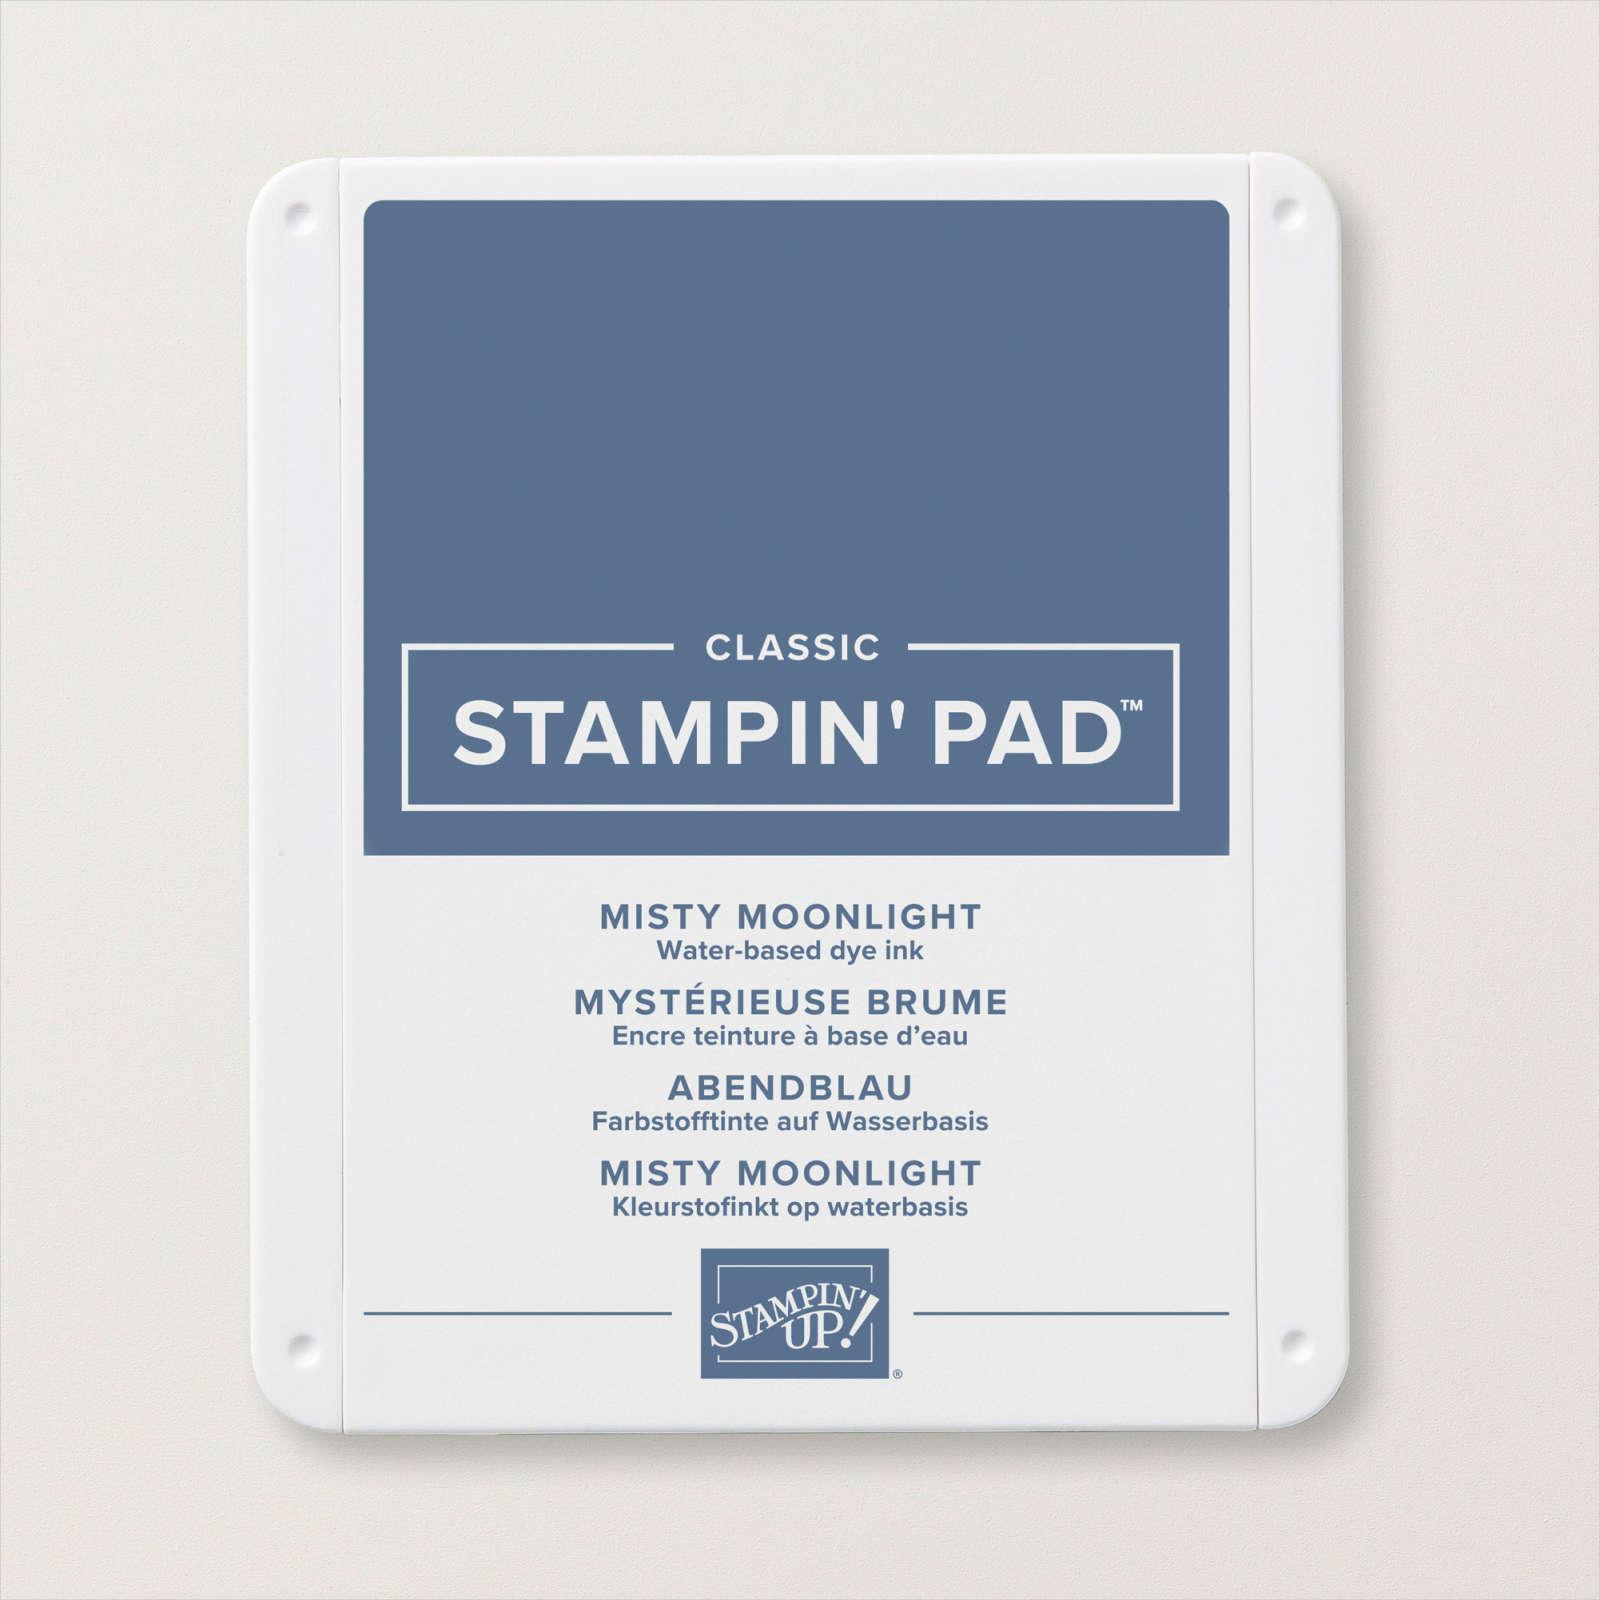 MISTY MOONLIGHT CLASSIC STAMPIN' PAD